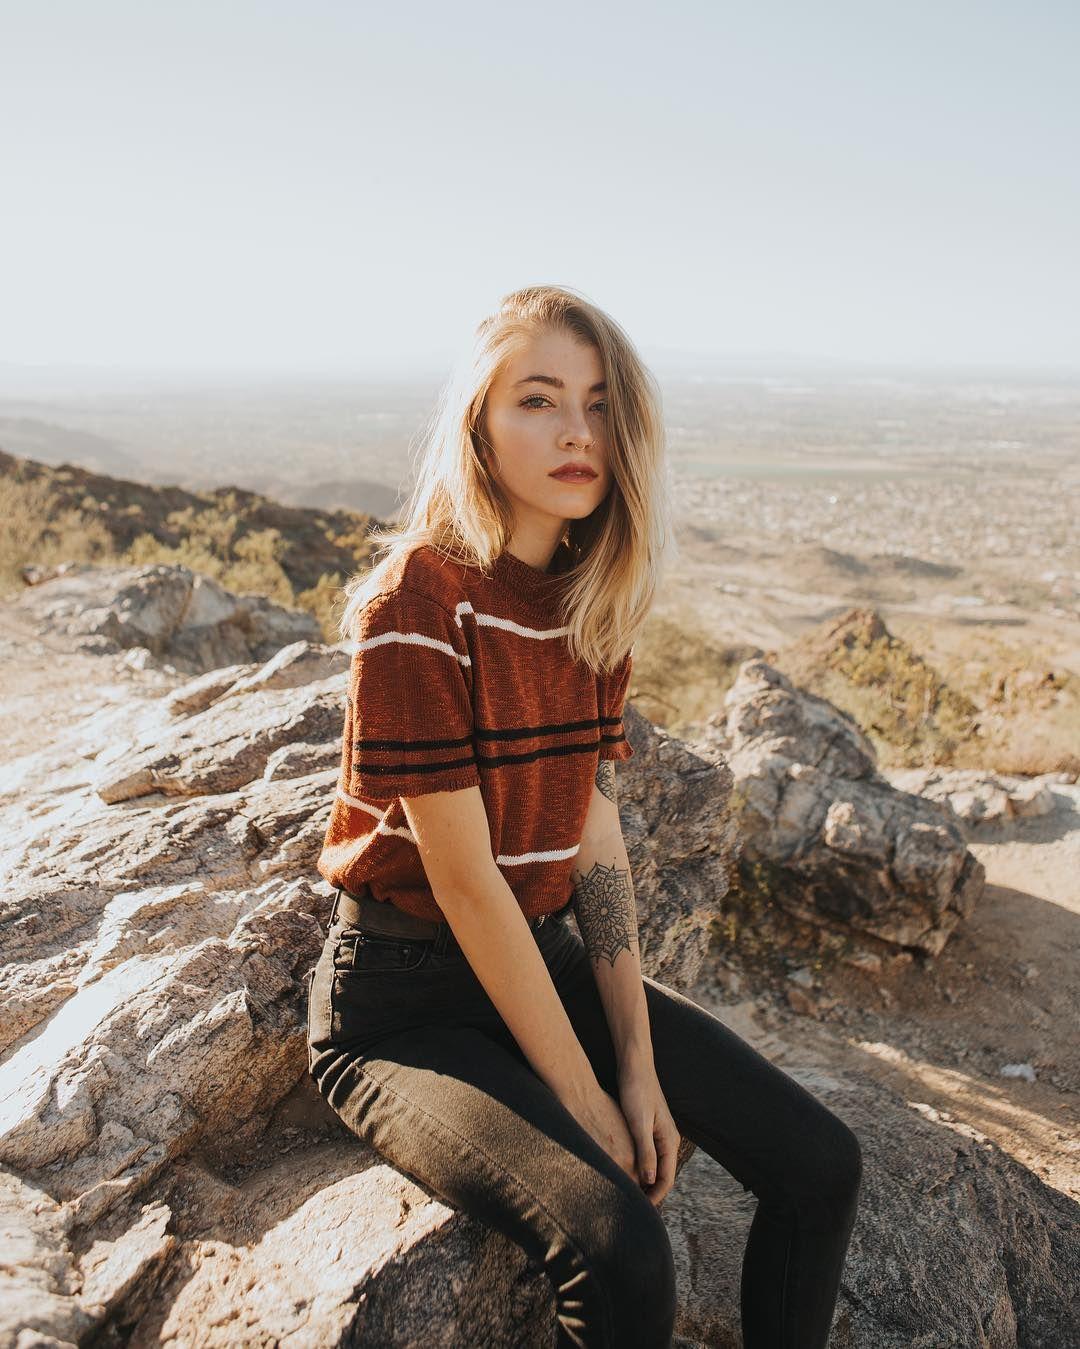 Beautiful Portrait Photography by Zach Leung inspiration